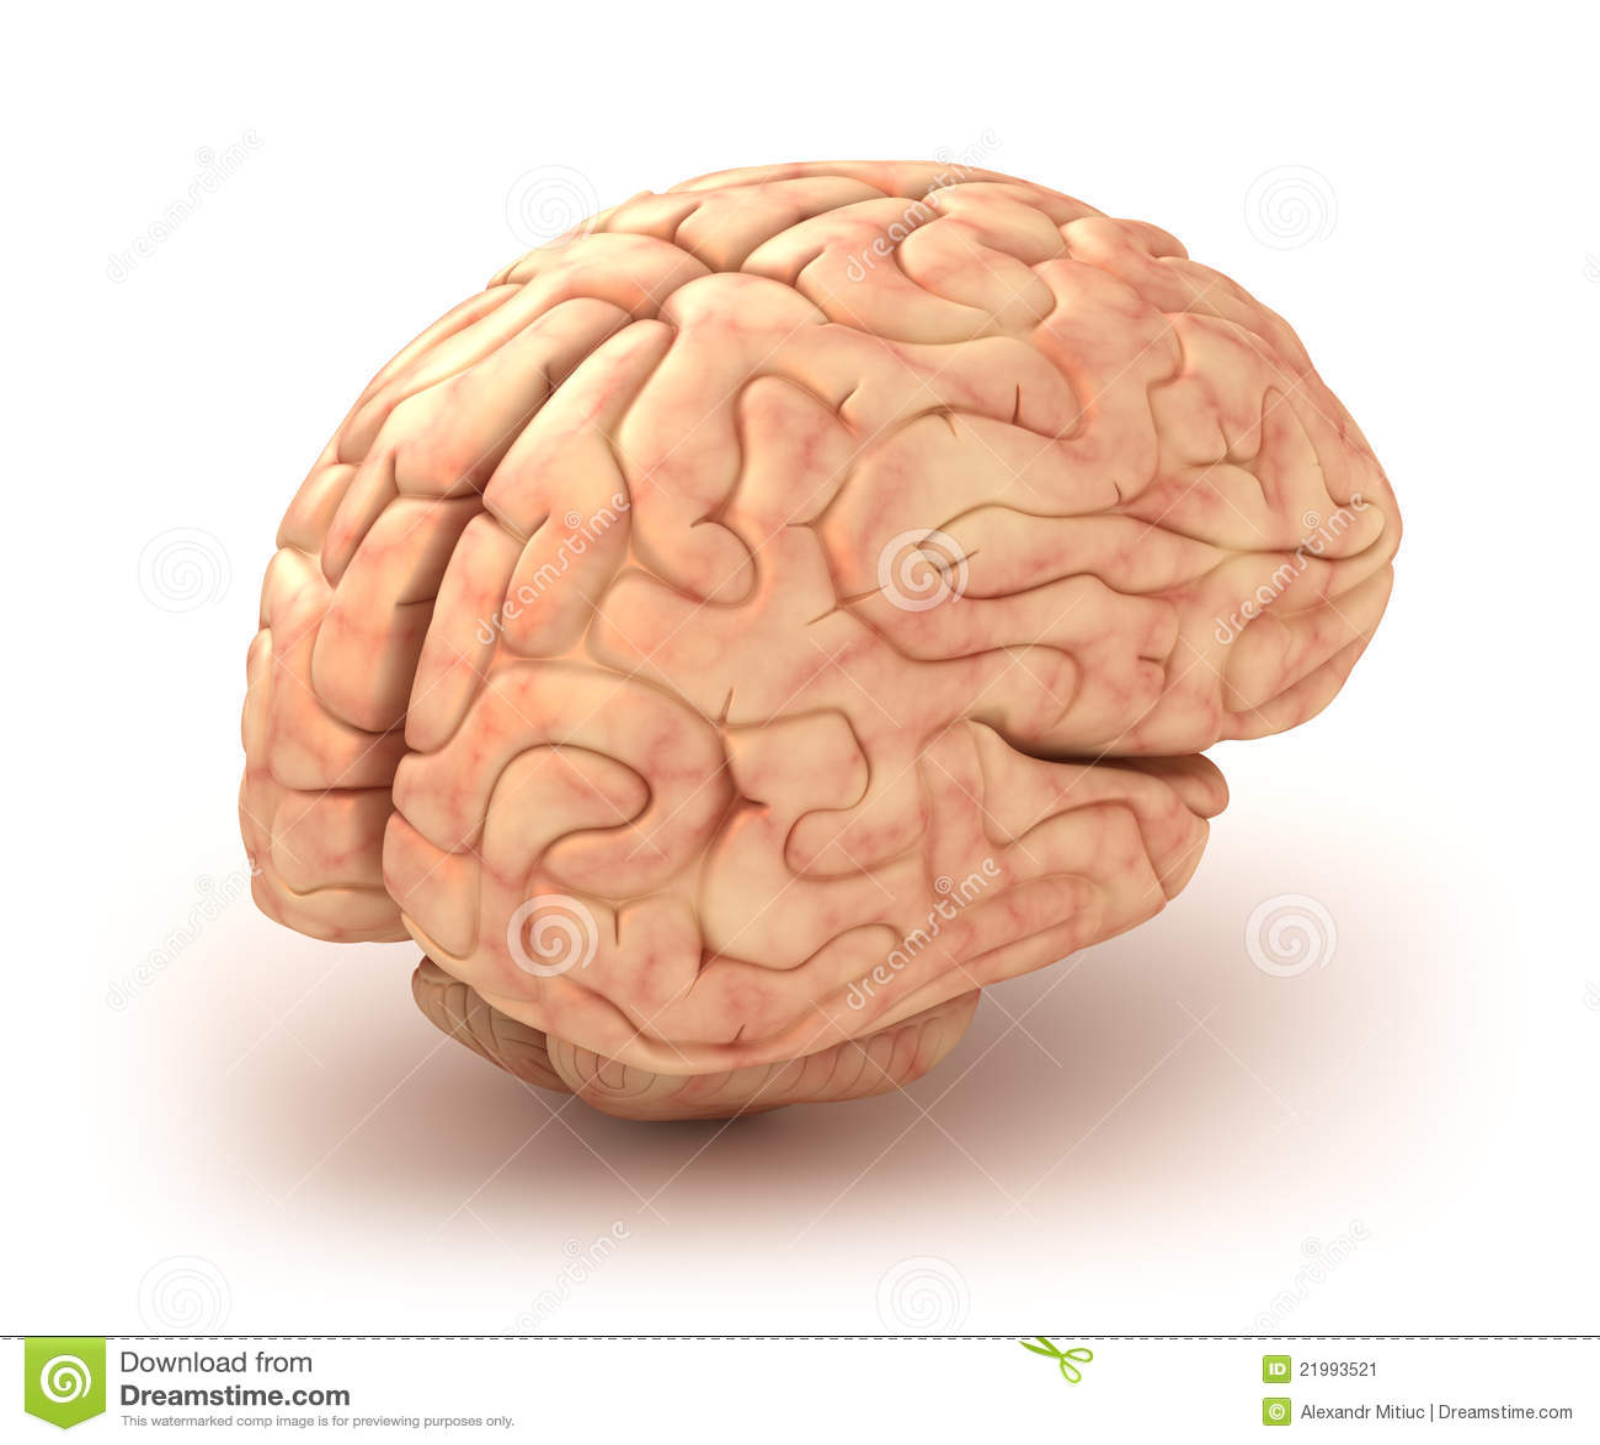 Human Brain 3D Model Stock Illustration. Illustration Of